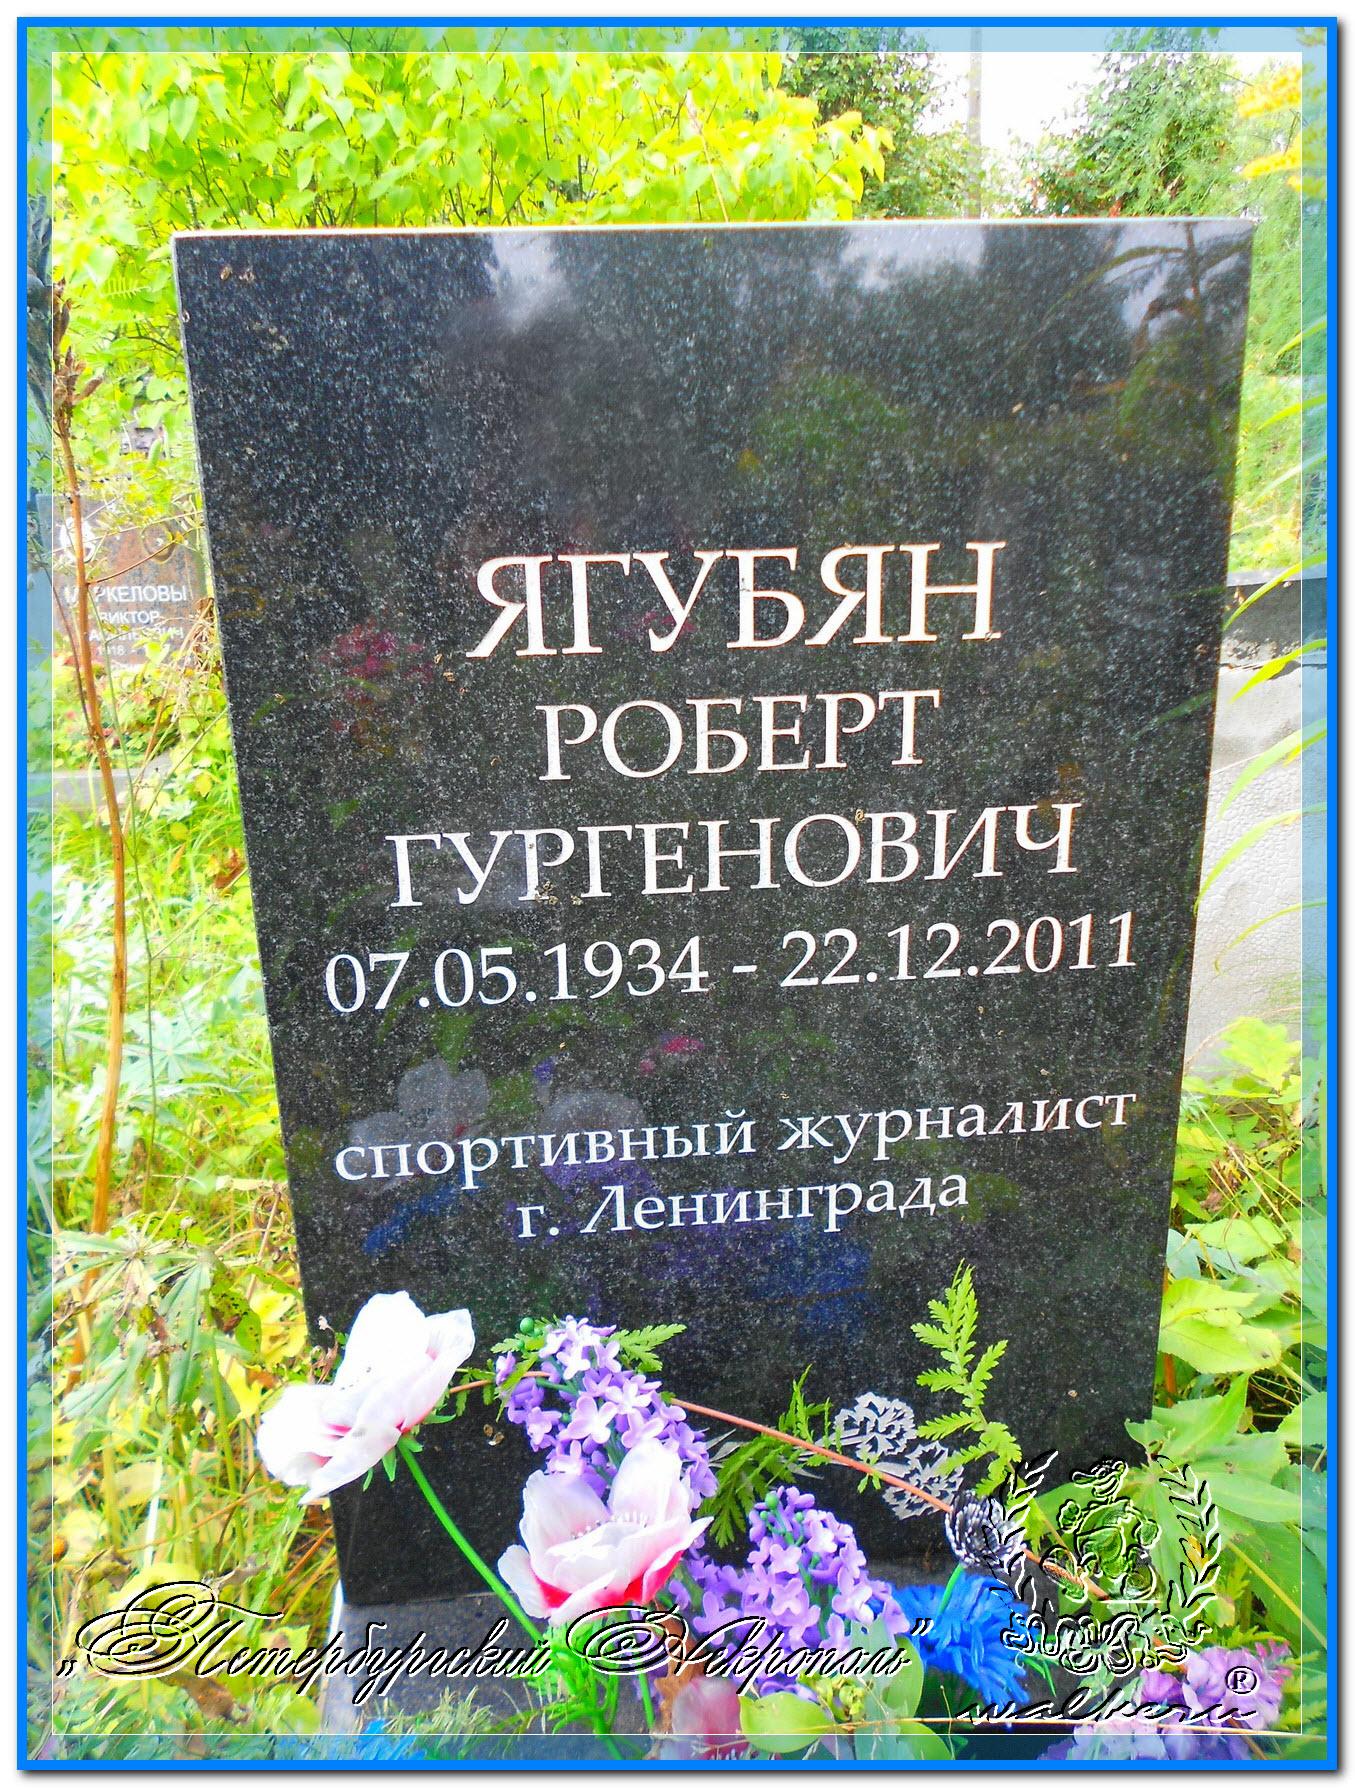 © ЯгубянРобертГургенович